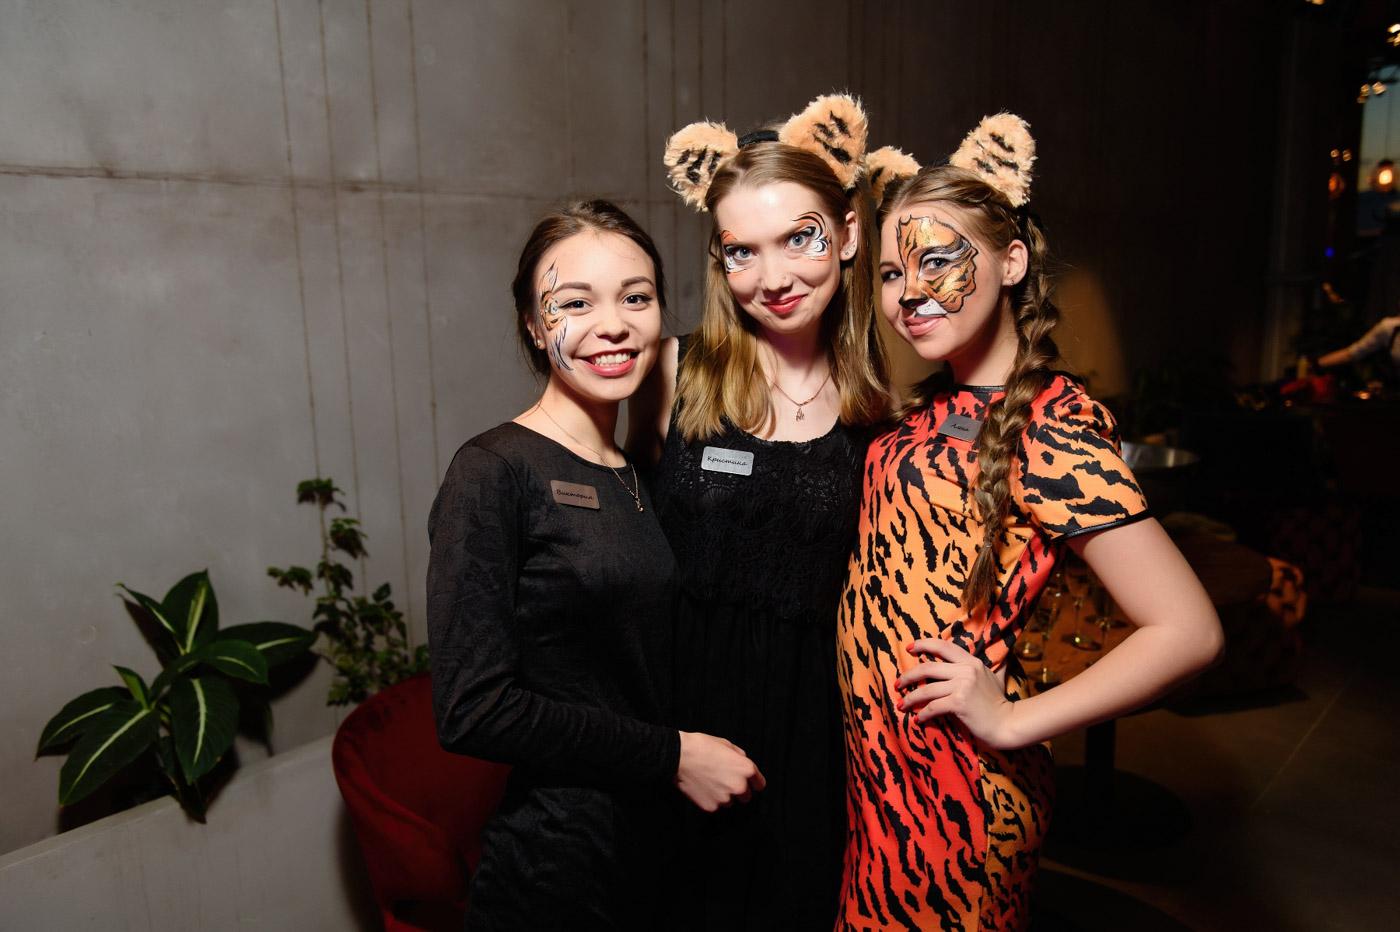 tiger_party--4.jpg